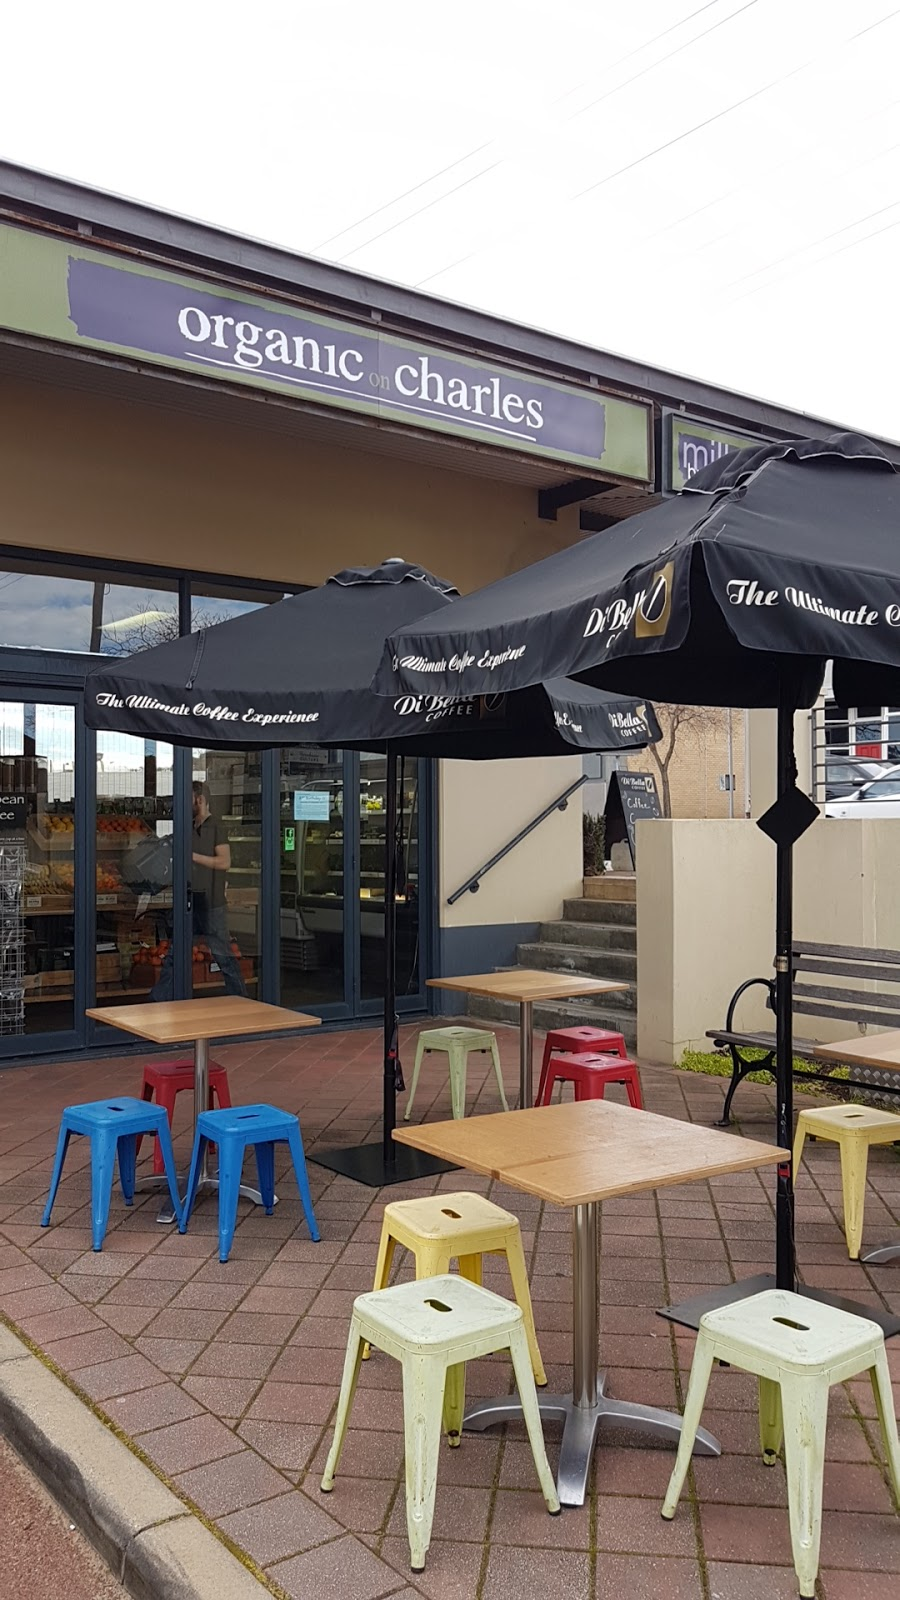 Organic on Charles | store | 299 Charles St, North Perth WA 6006, Australia | 0892277755 OR +61 8 9227 7755